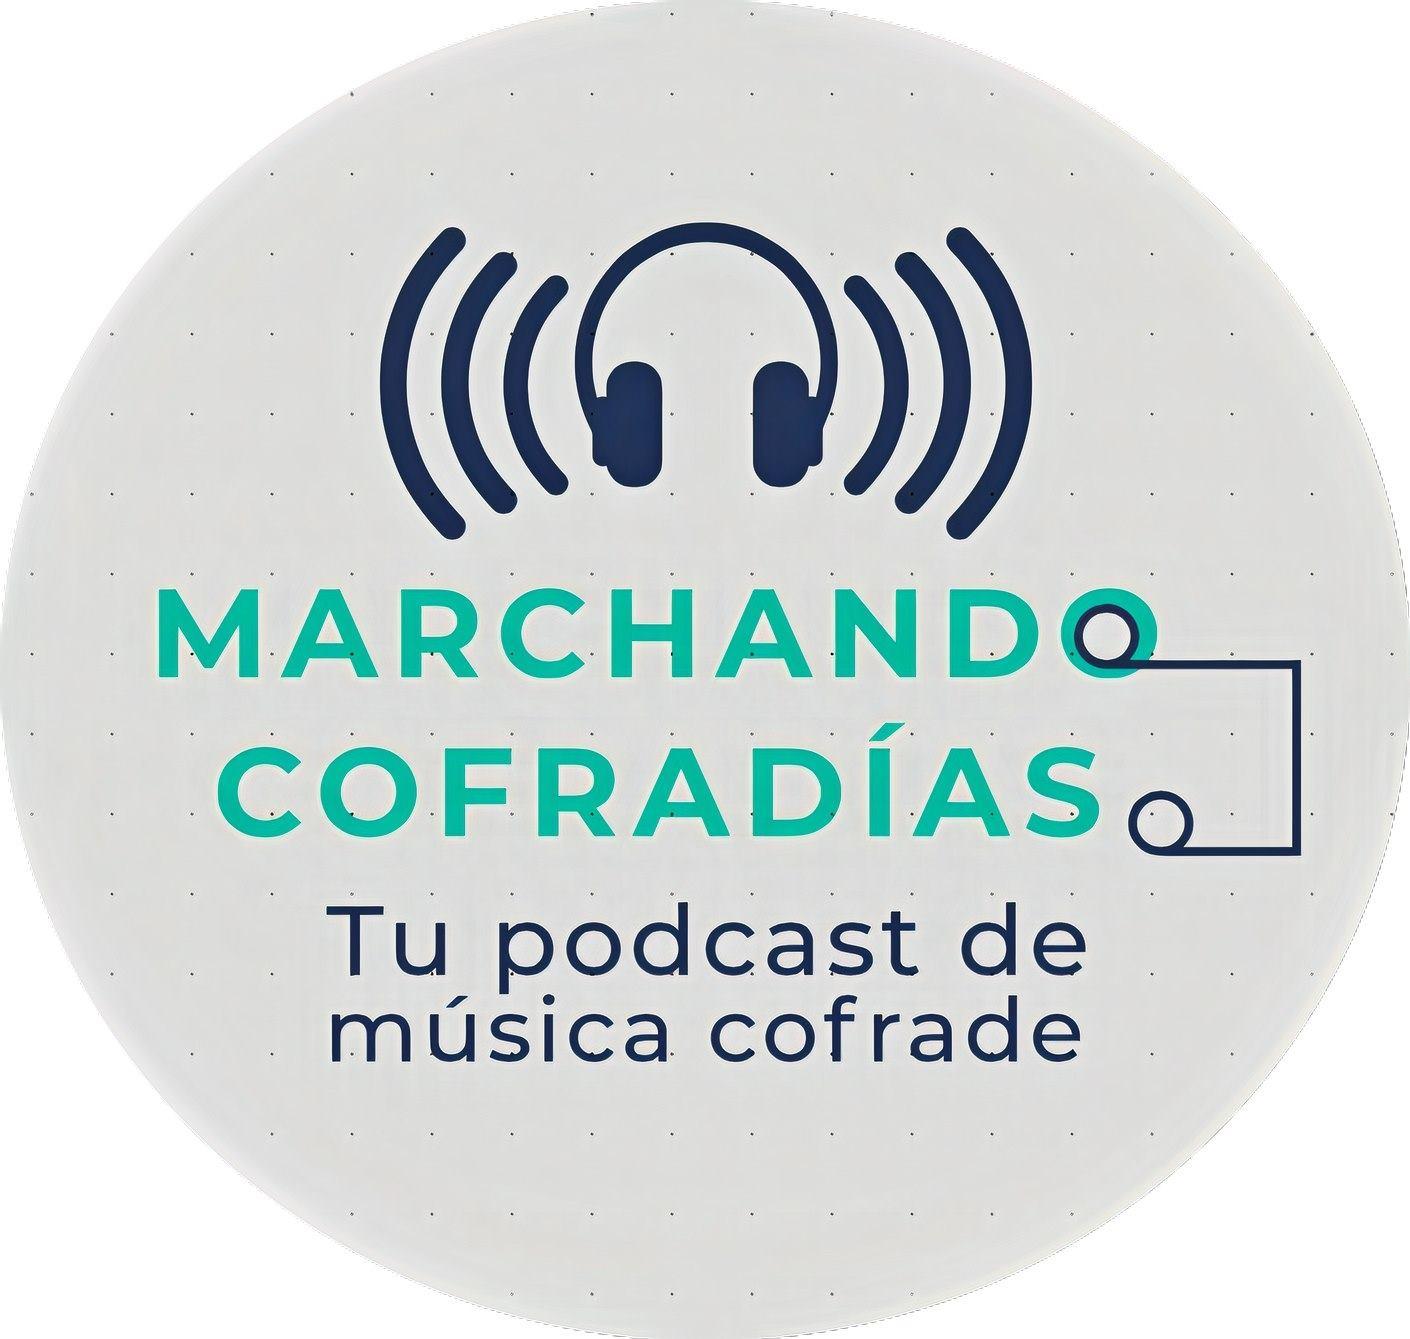 MARCHANDO COFRADIAS-EPISODIO 3